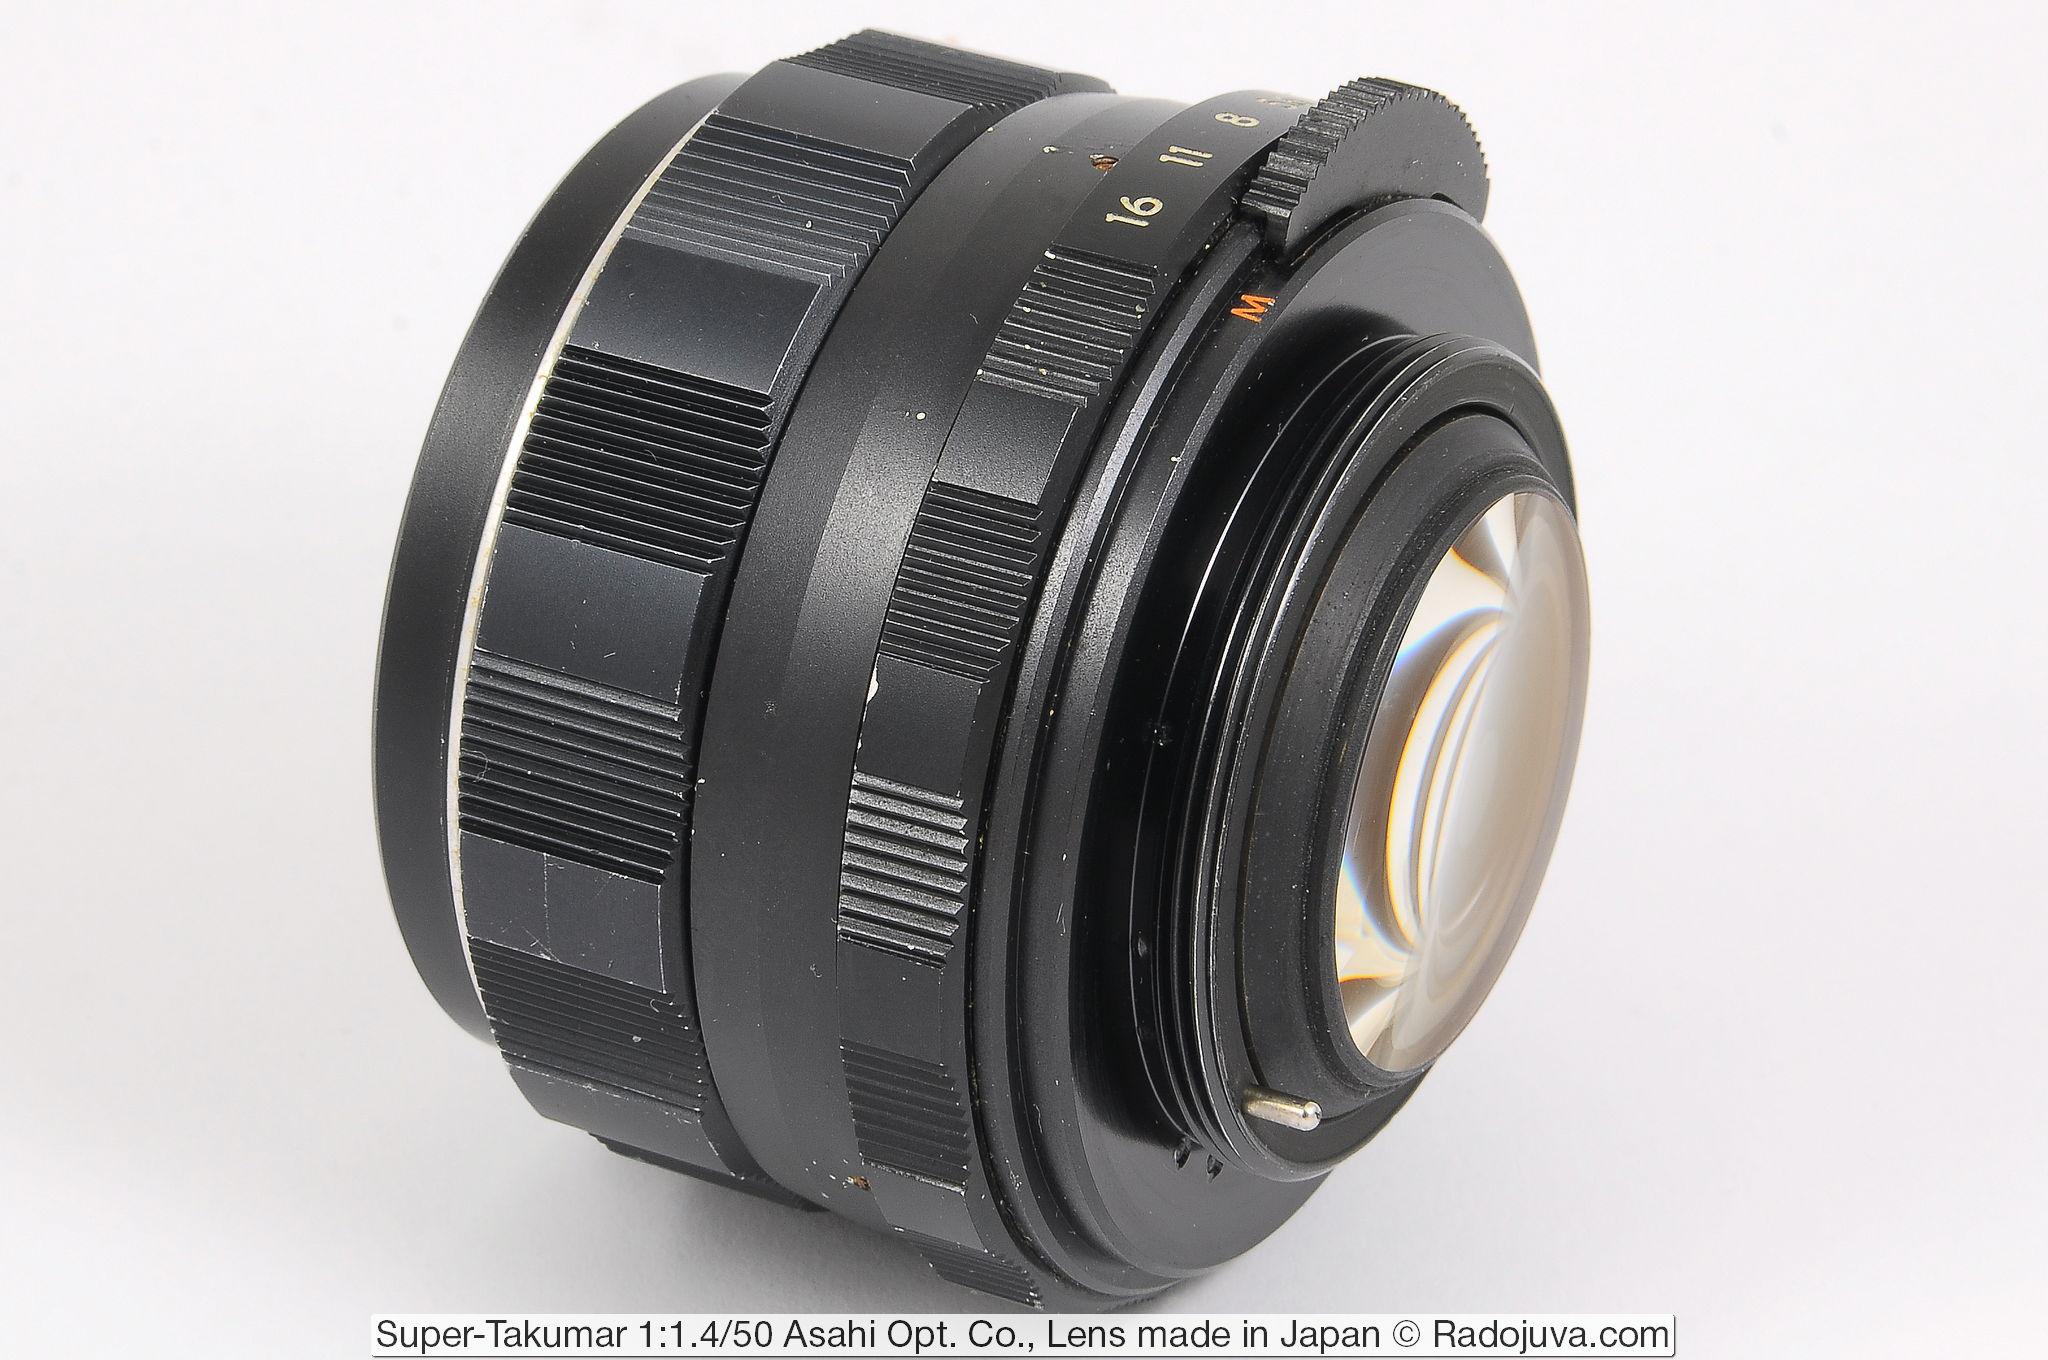 Super-Takumar 1:1.4/50 Asahi Opt. Co.,